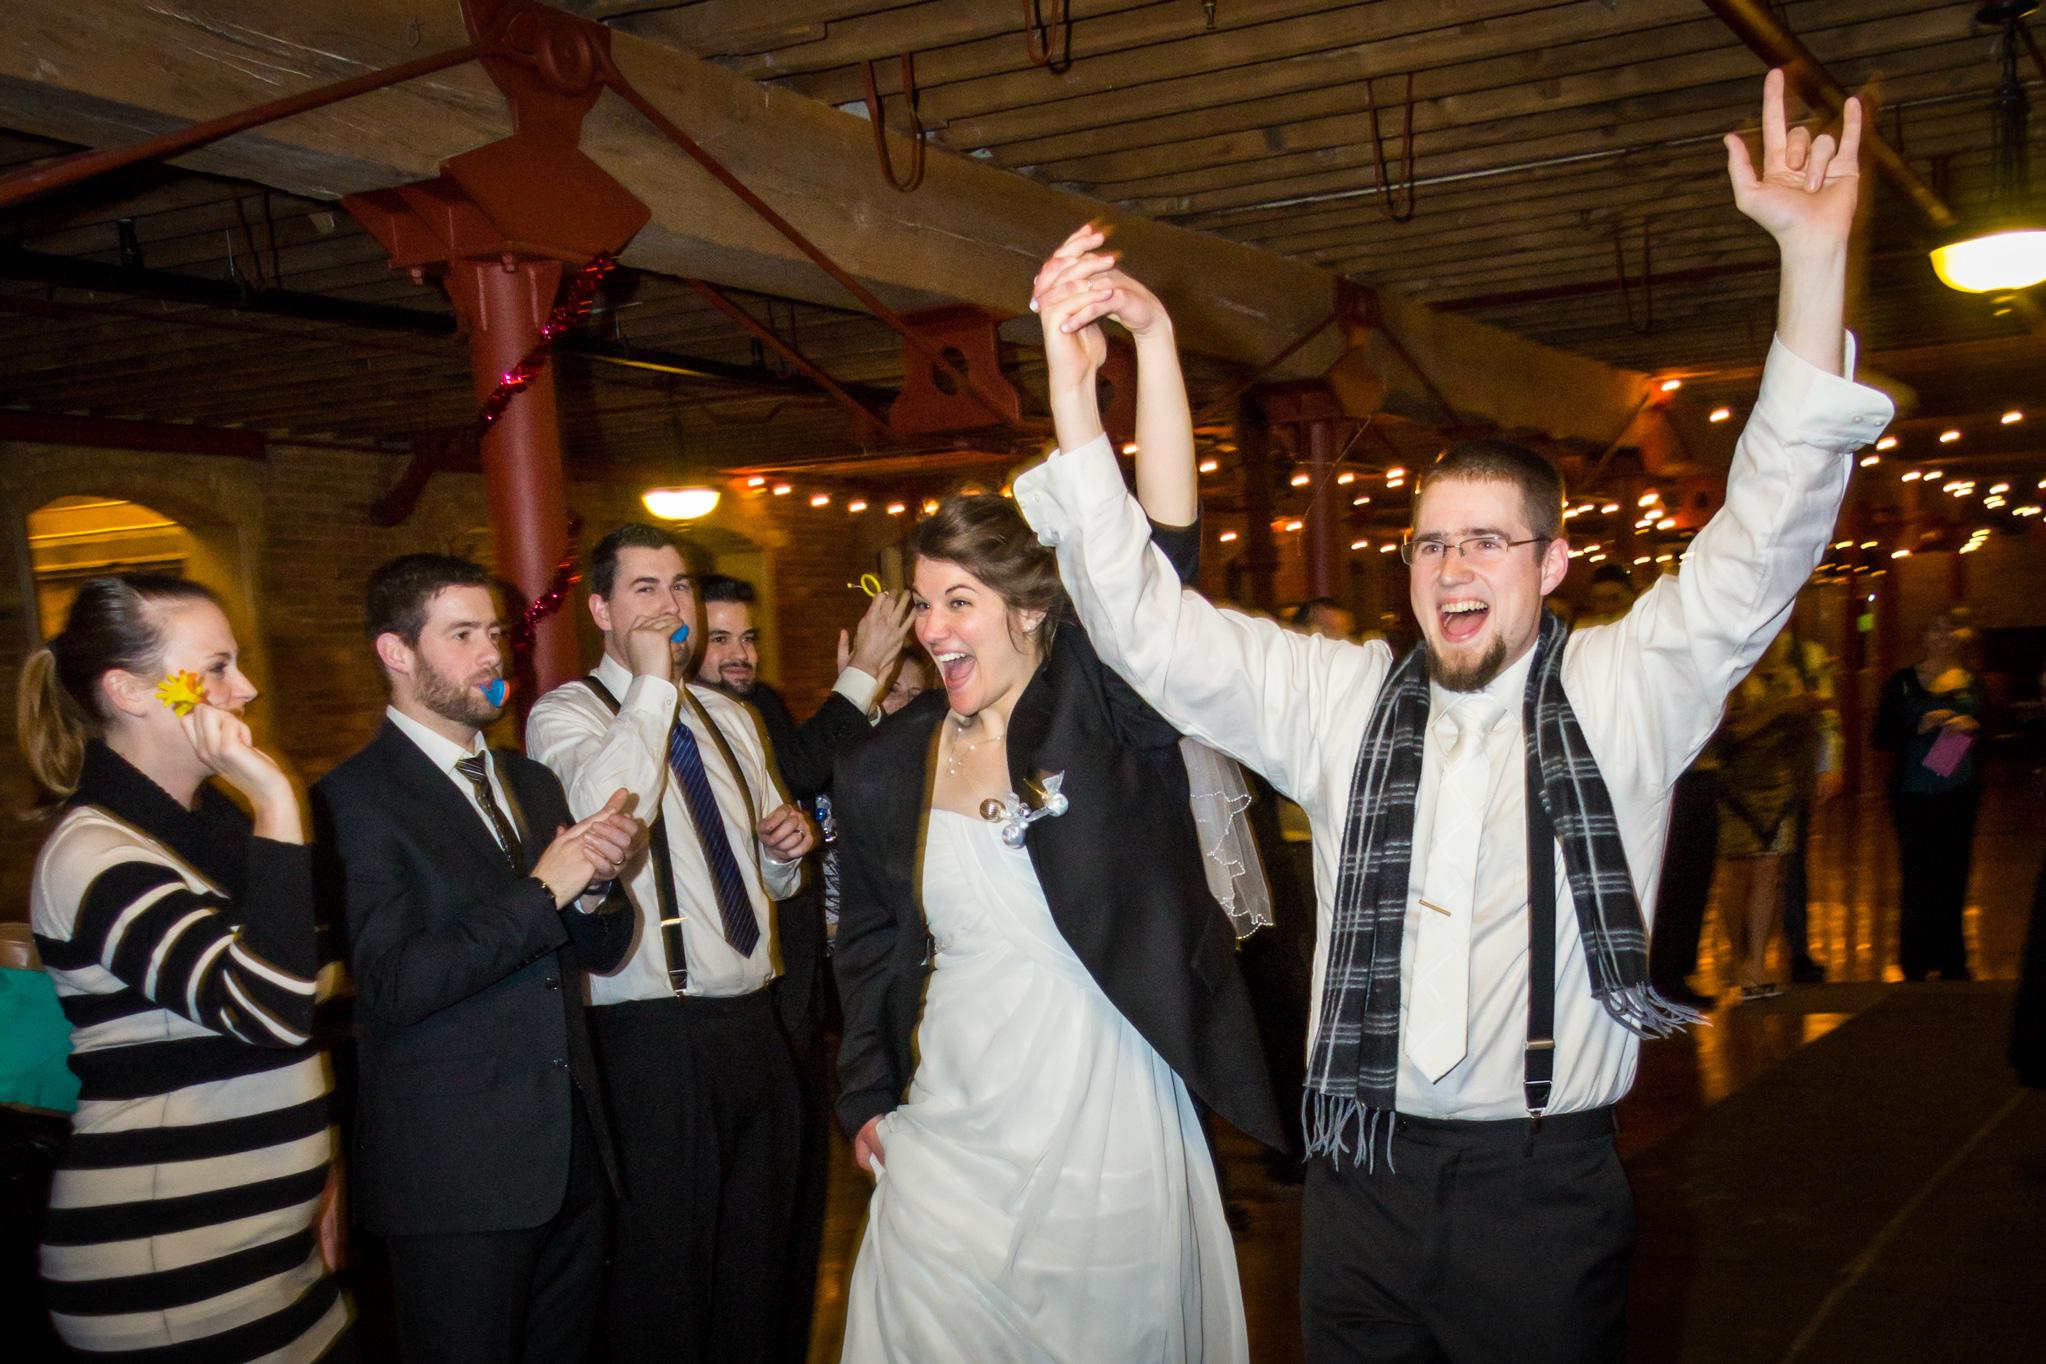 starline_factory_wedding_exit_ring_dance.jpg